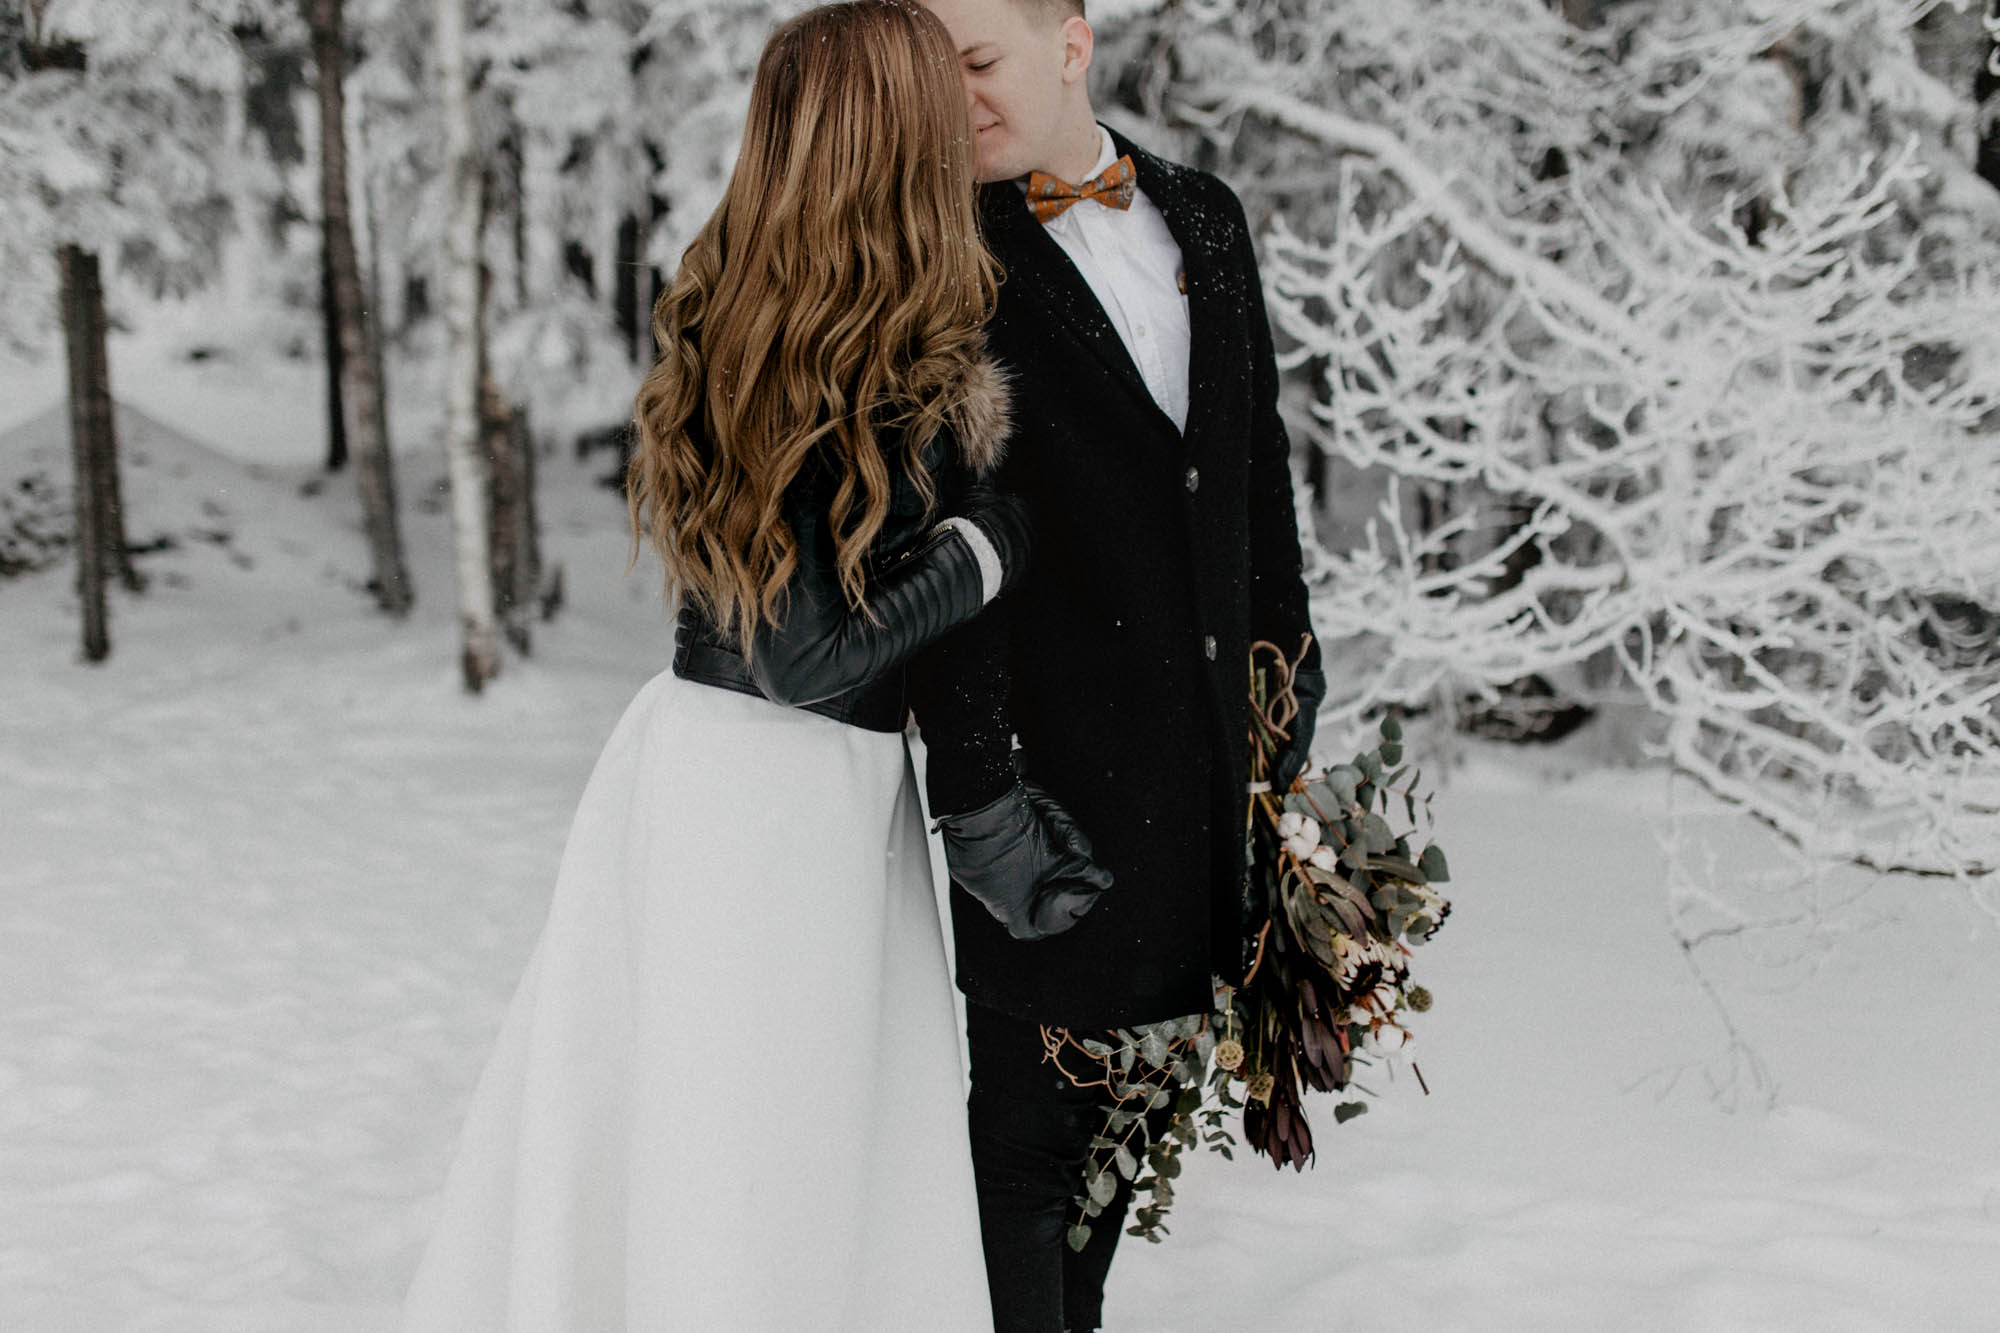 ashley_schulman_photography-winter_wedding_tampere-42.jpg